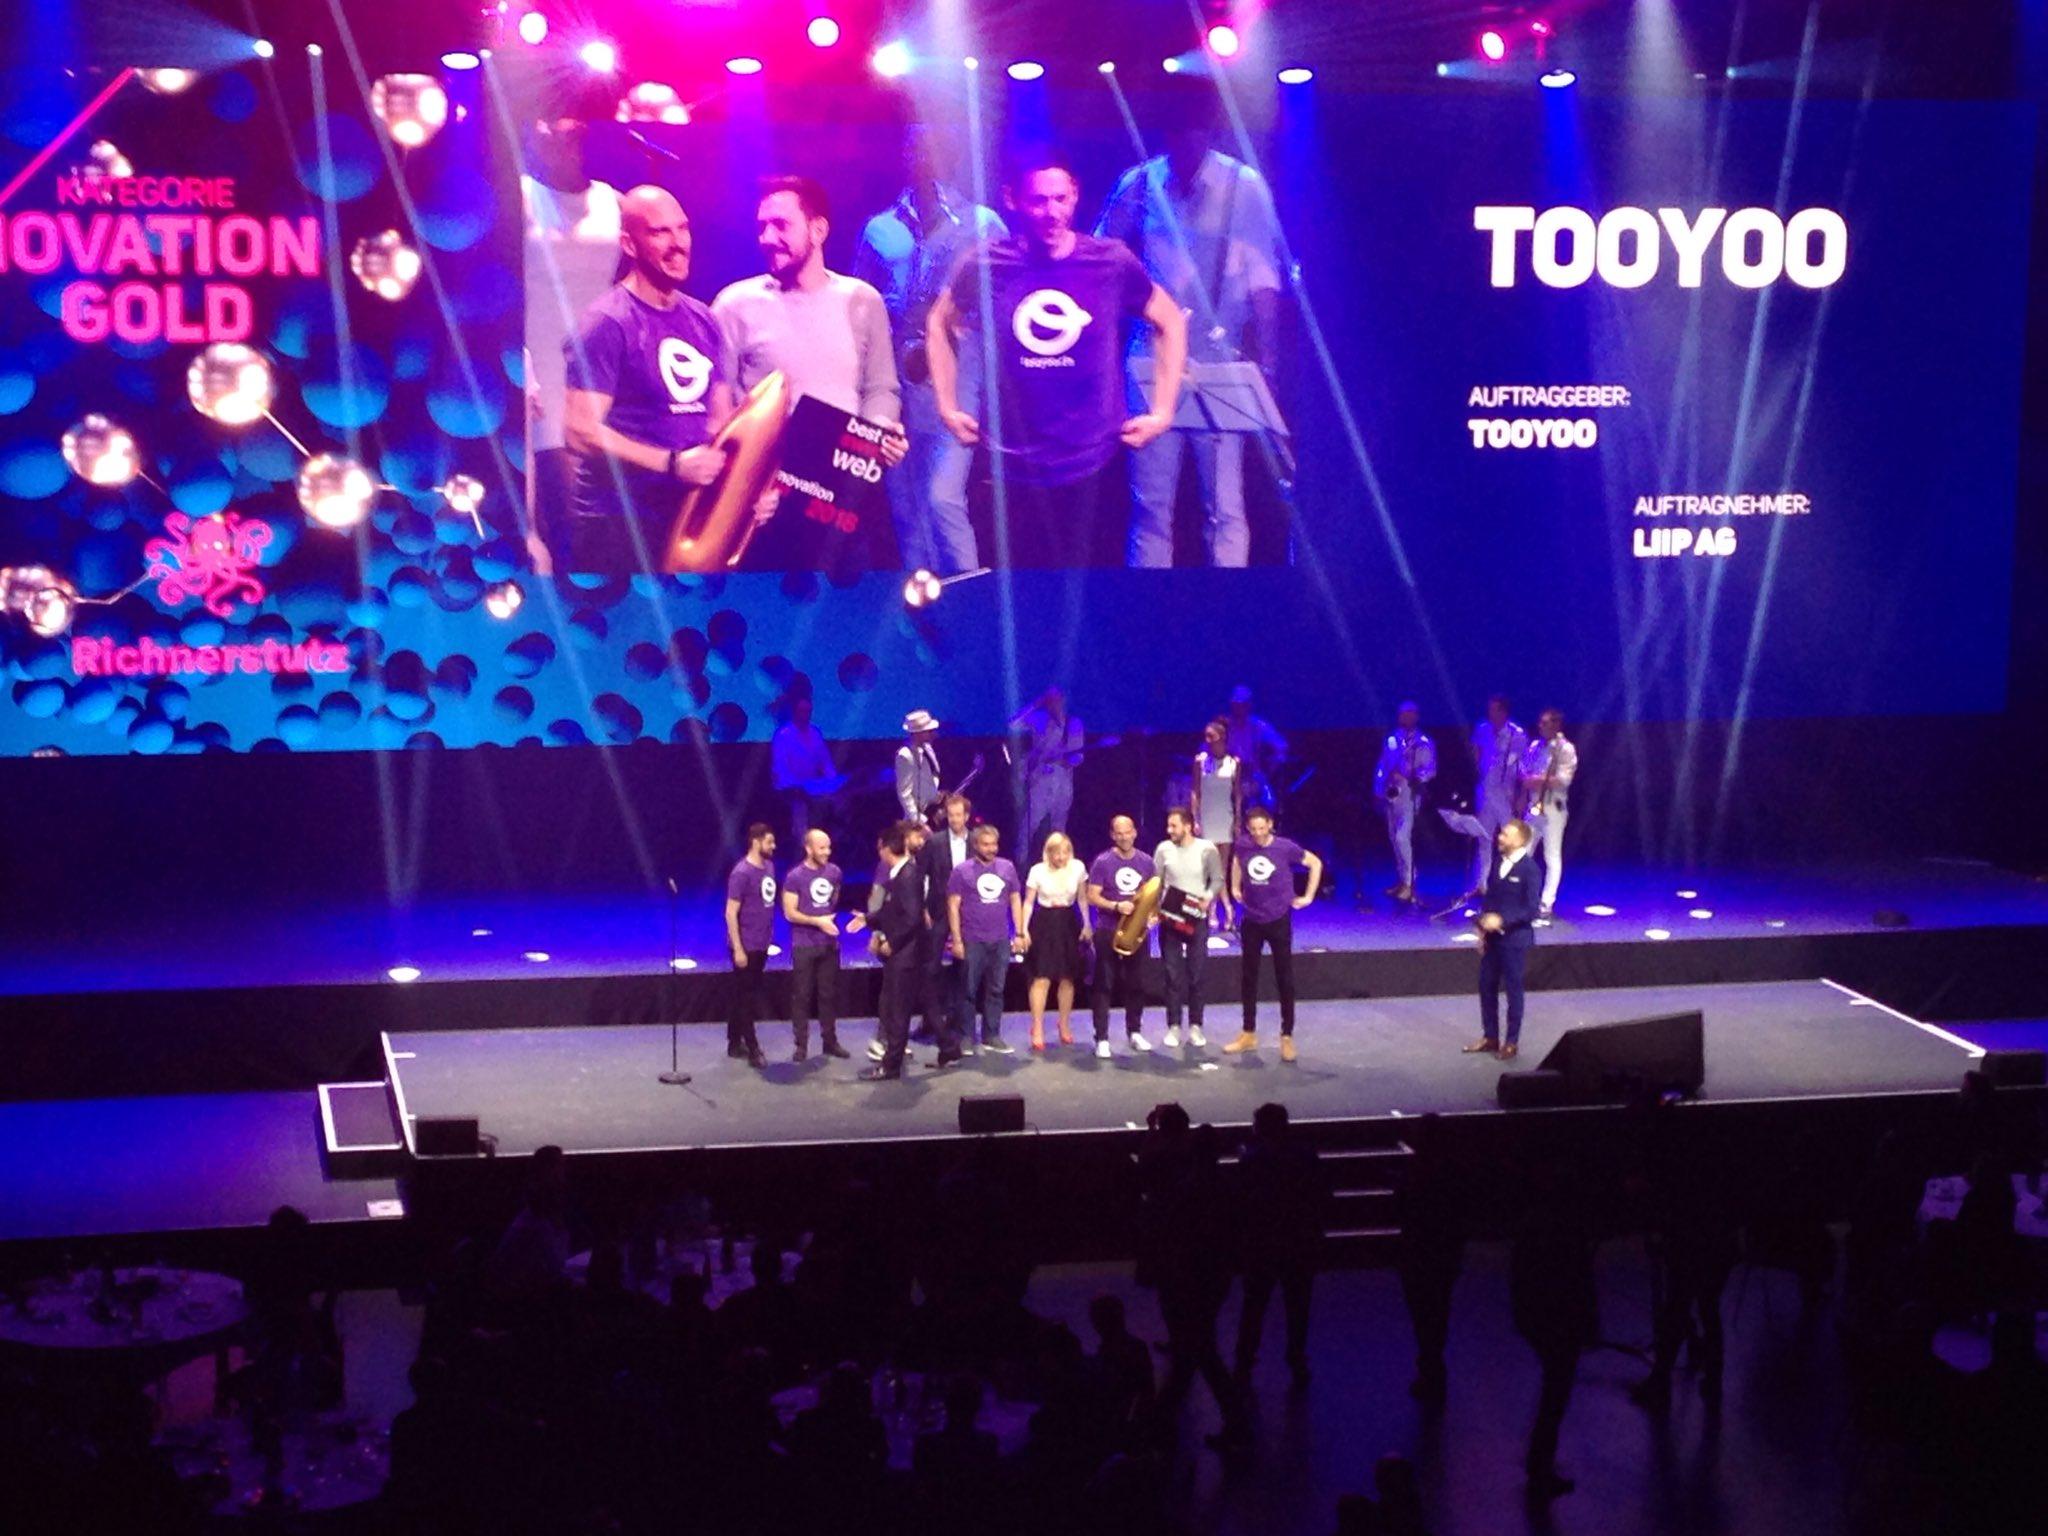 Gold award inovation tooyoo - best of swiss web 2018